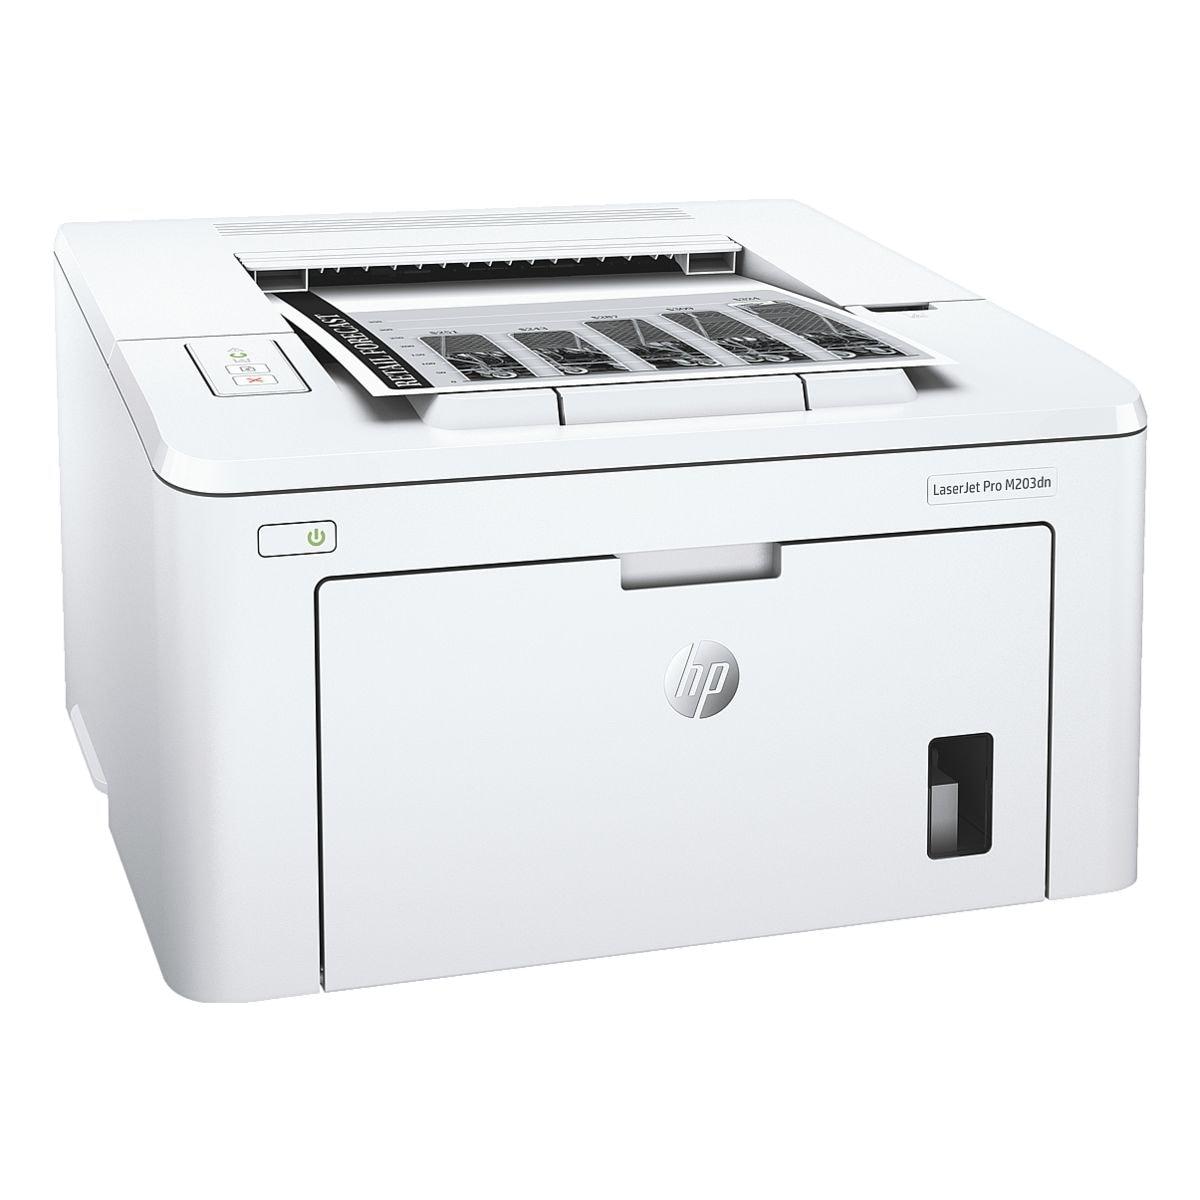 HP Laserdrucker LaserJet Pro M203dn, A4 schwarz weiß Laserdrucker, 1200 x 1200 dpi, mit LAN